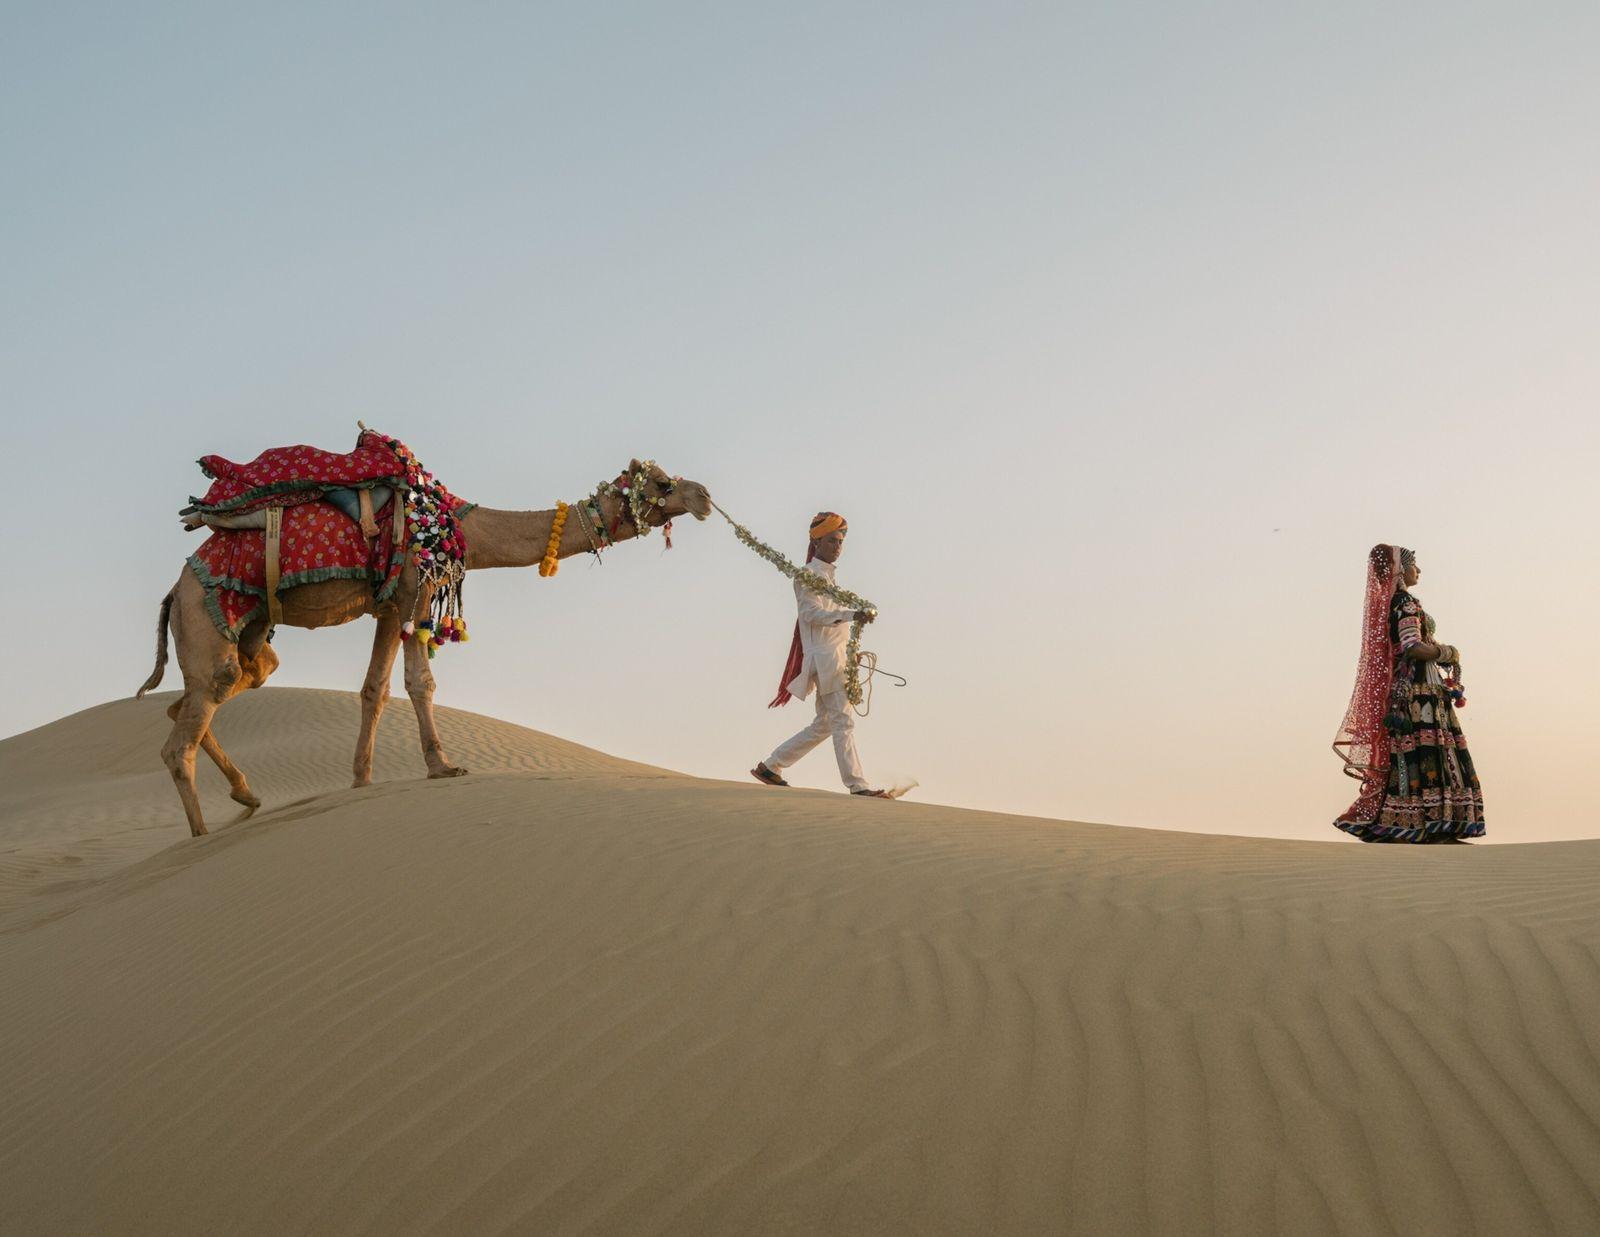 01-sunset-camel-ride